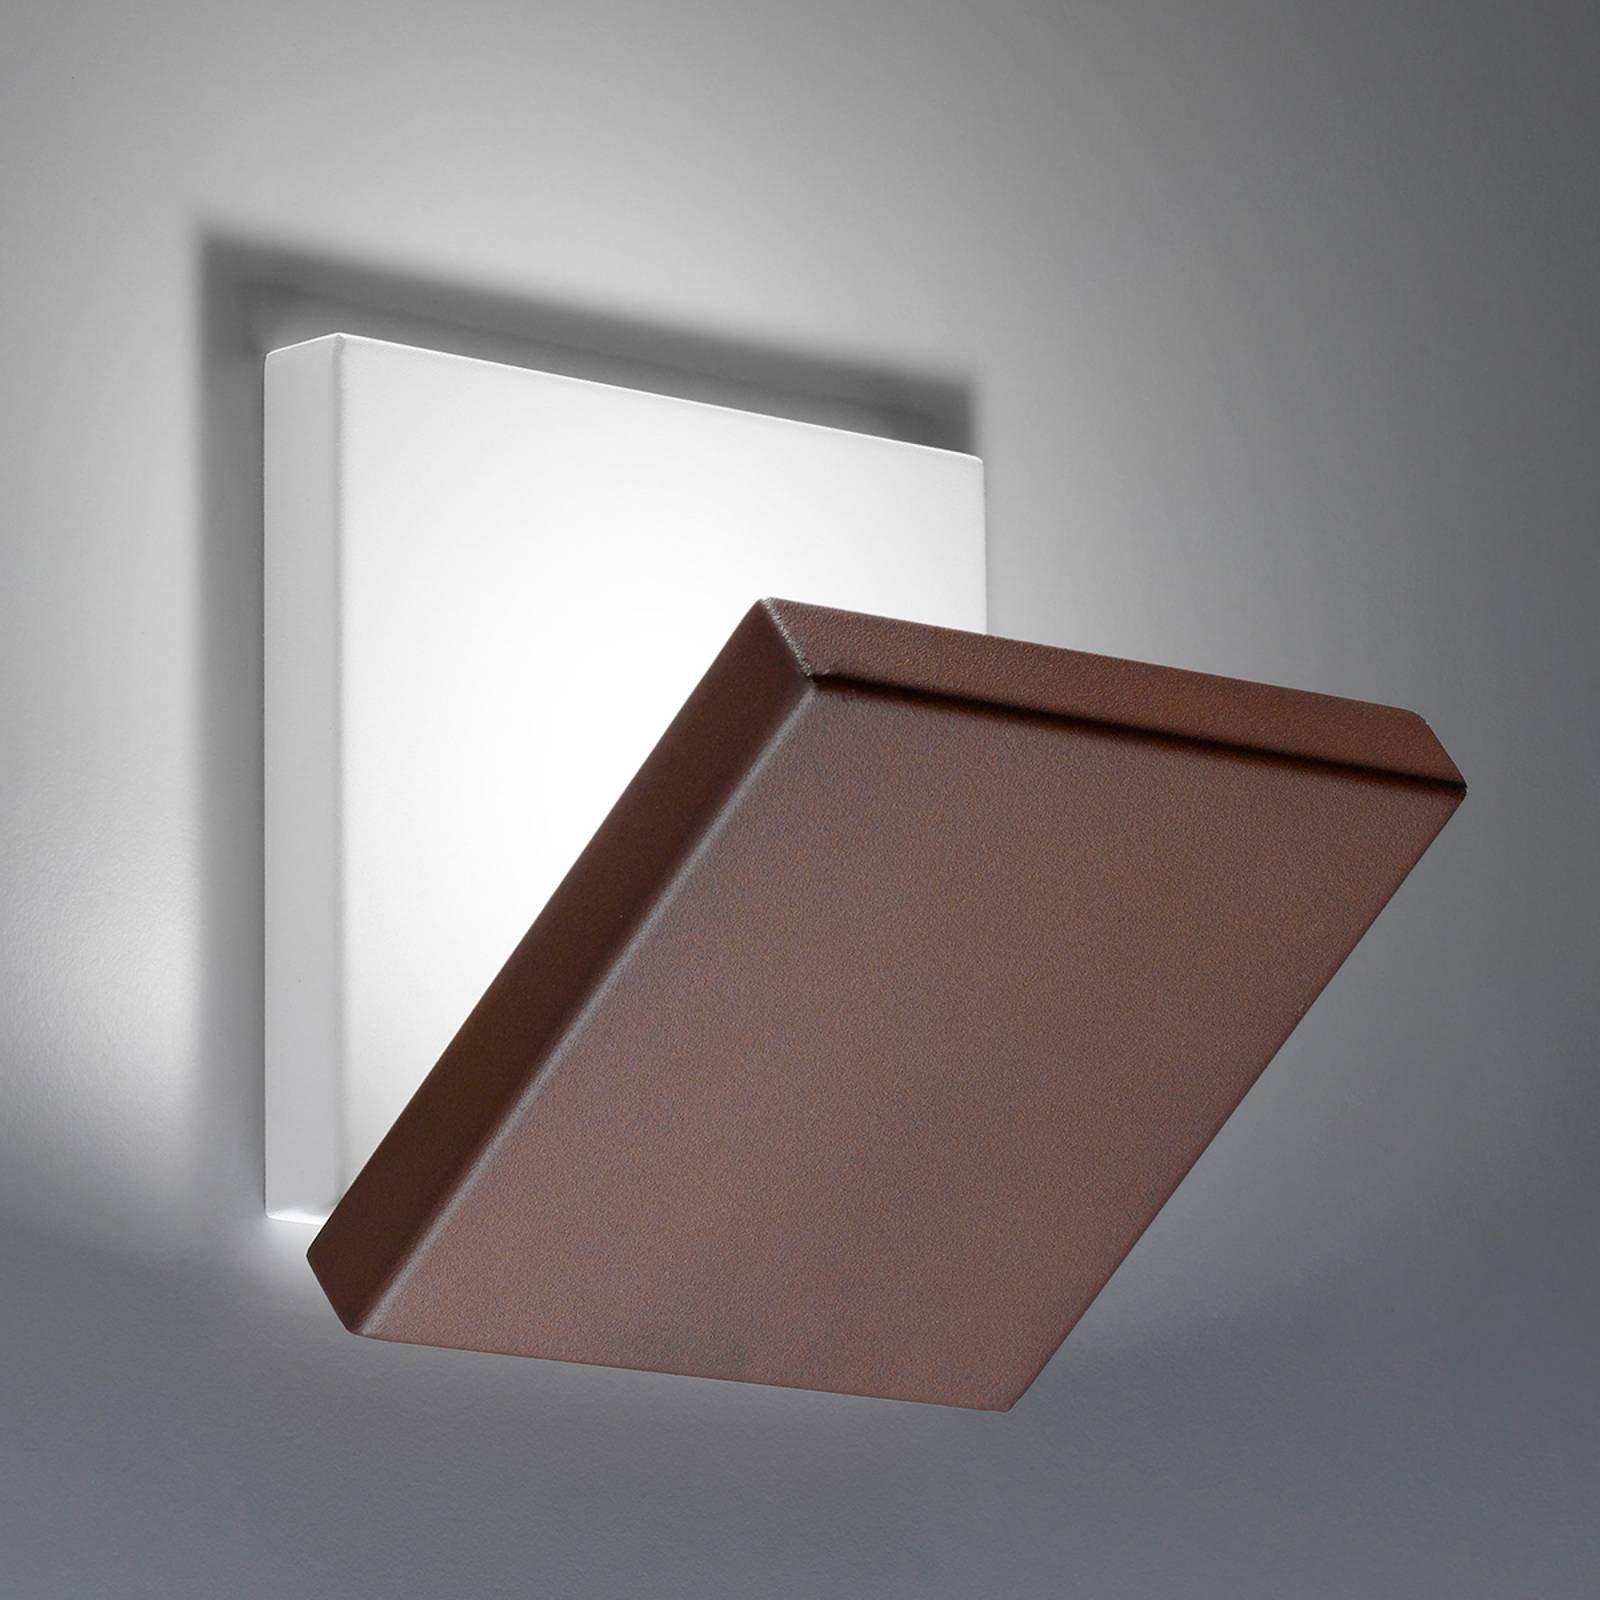 Foldbar LED-vegglampe Spy med brun front